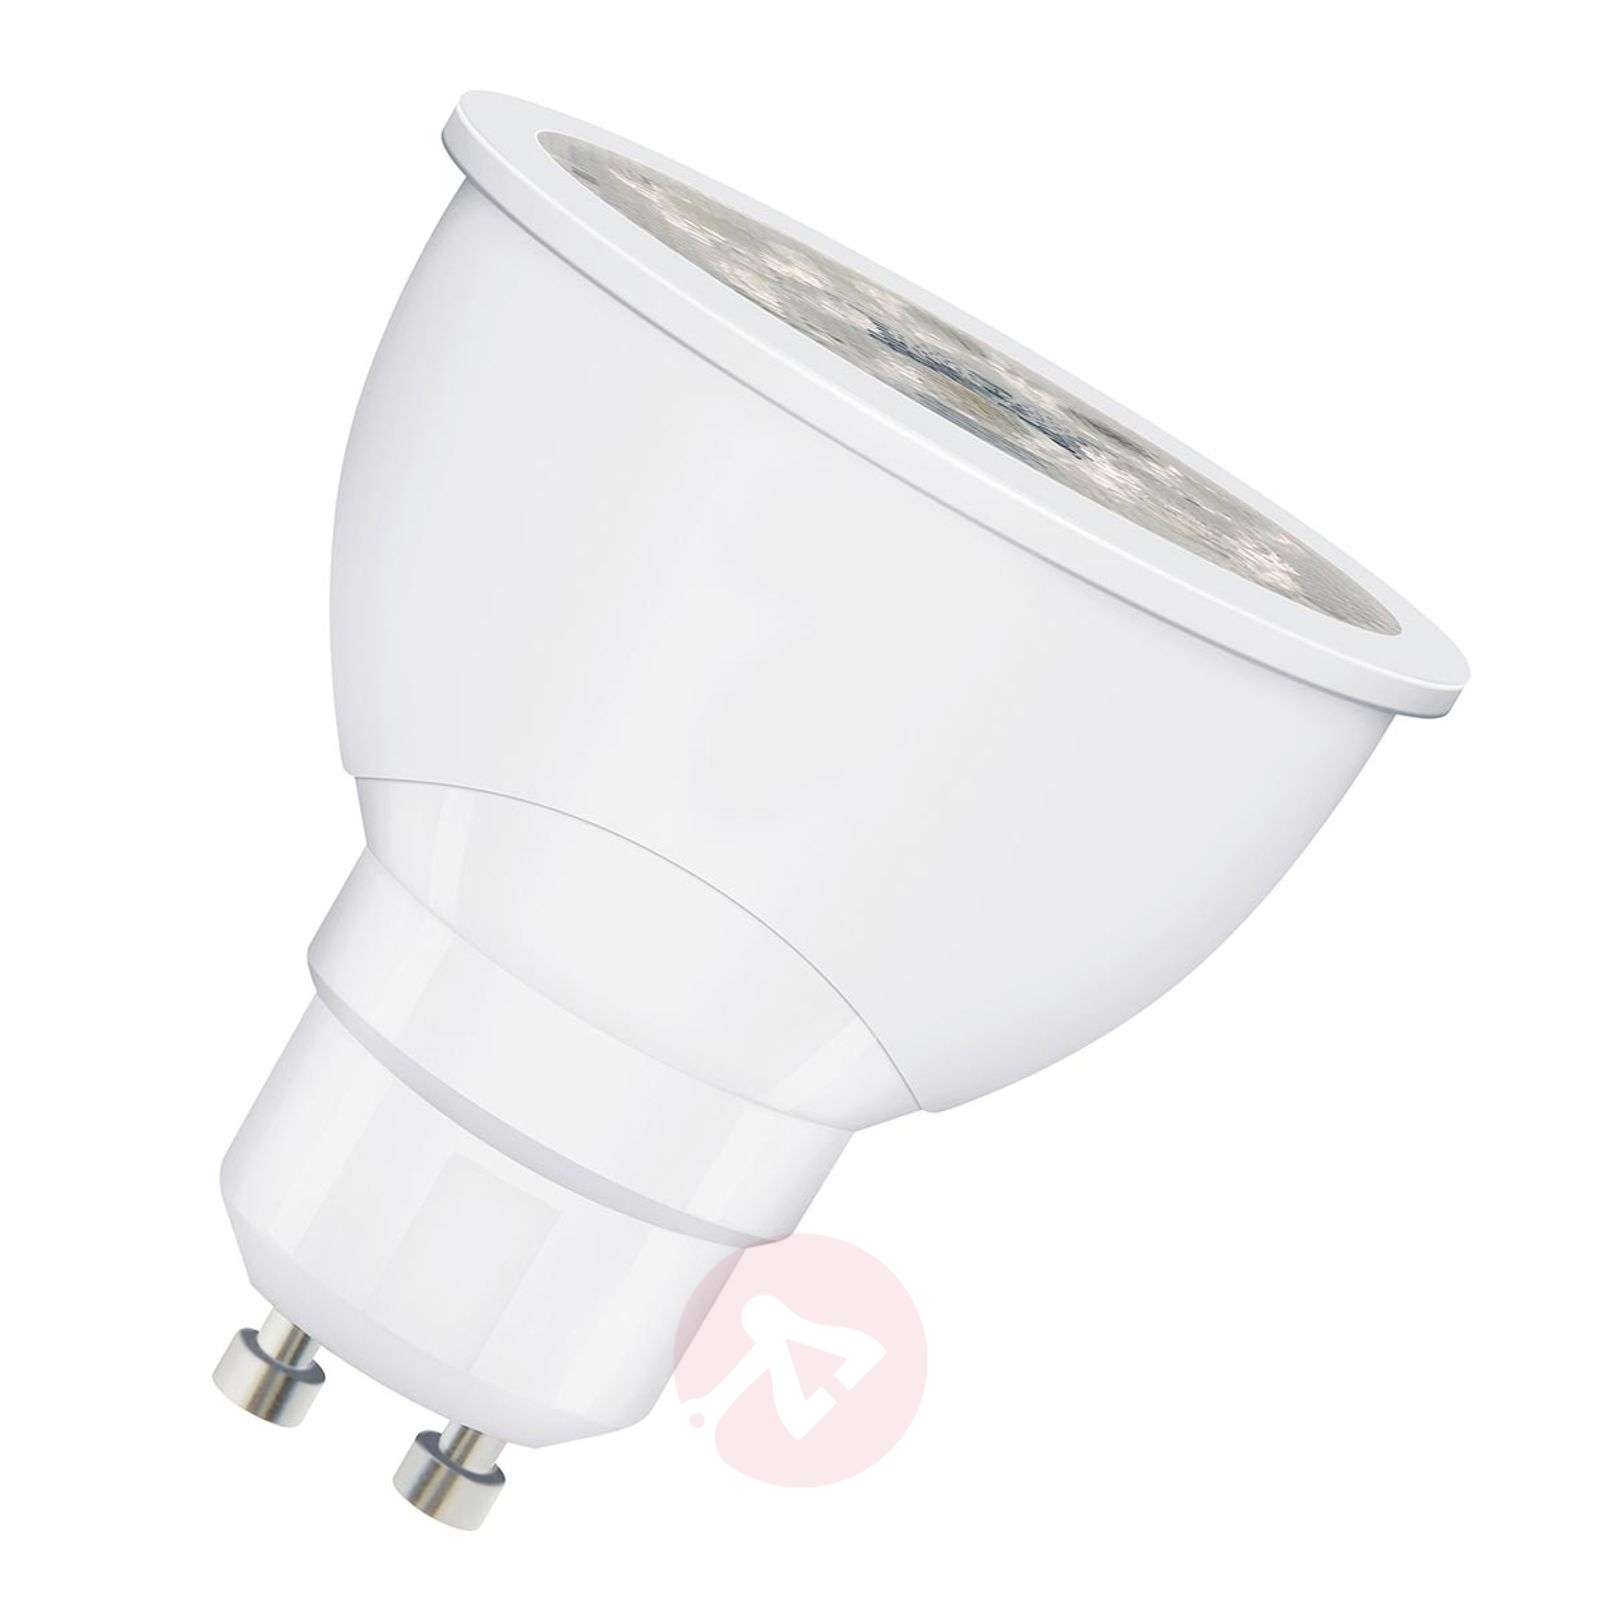 SMART+ GU10 4,5W Tuneable White, 350 lm, himmennys-7262127-01